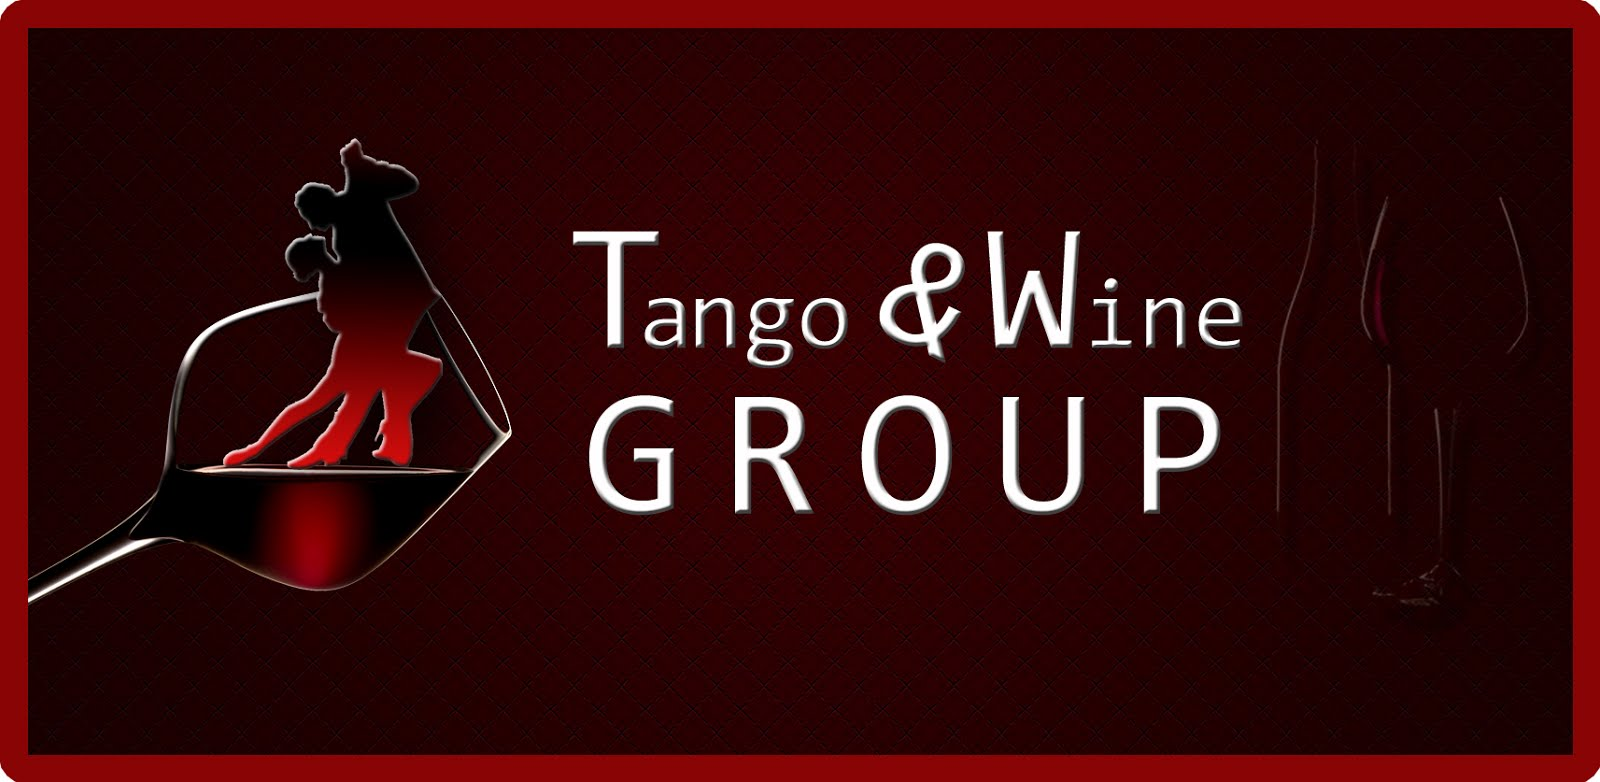 TANGO&WINE GROUP ORGANIZZA